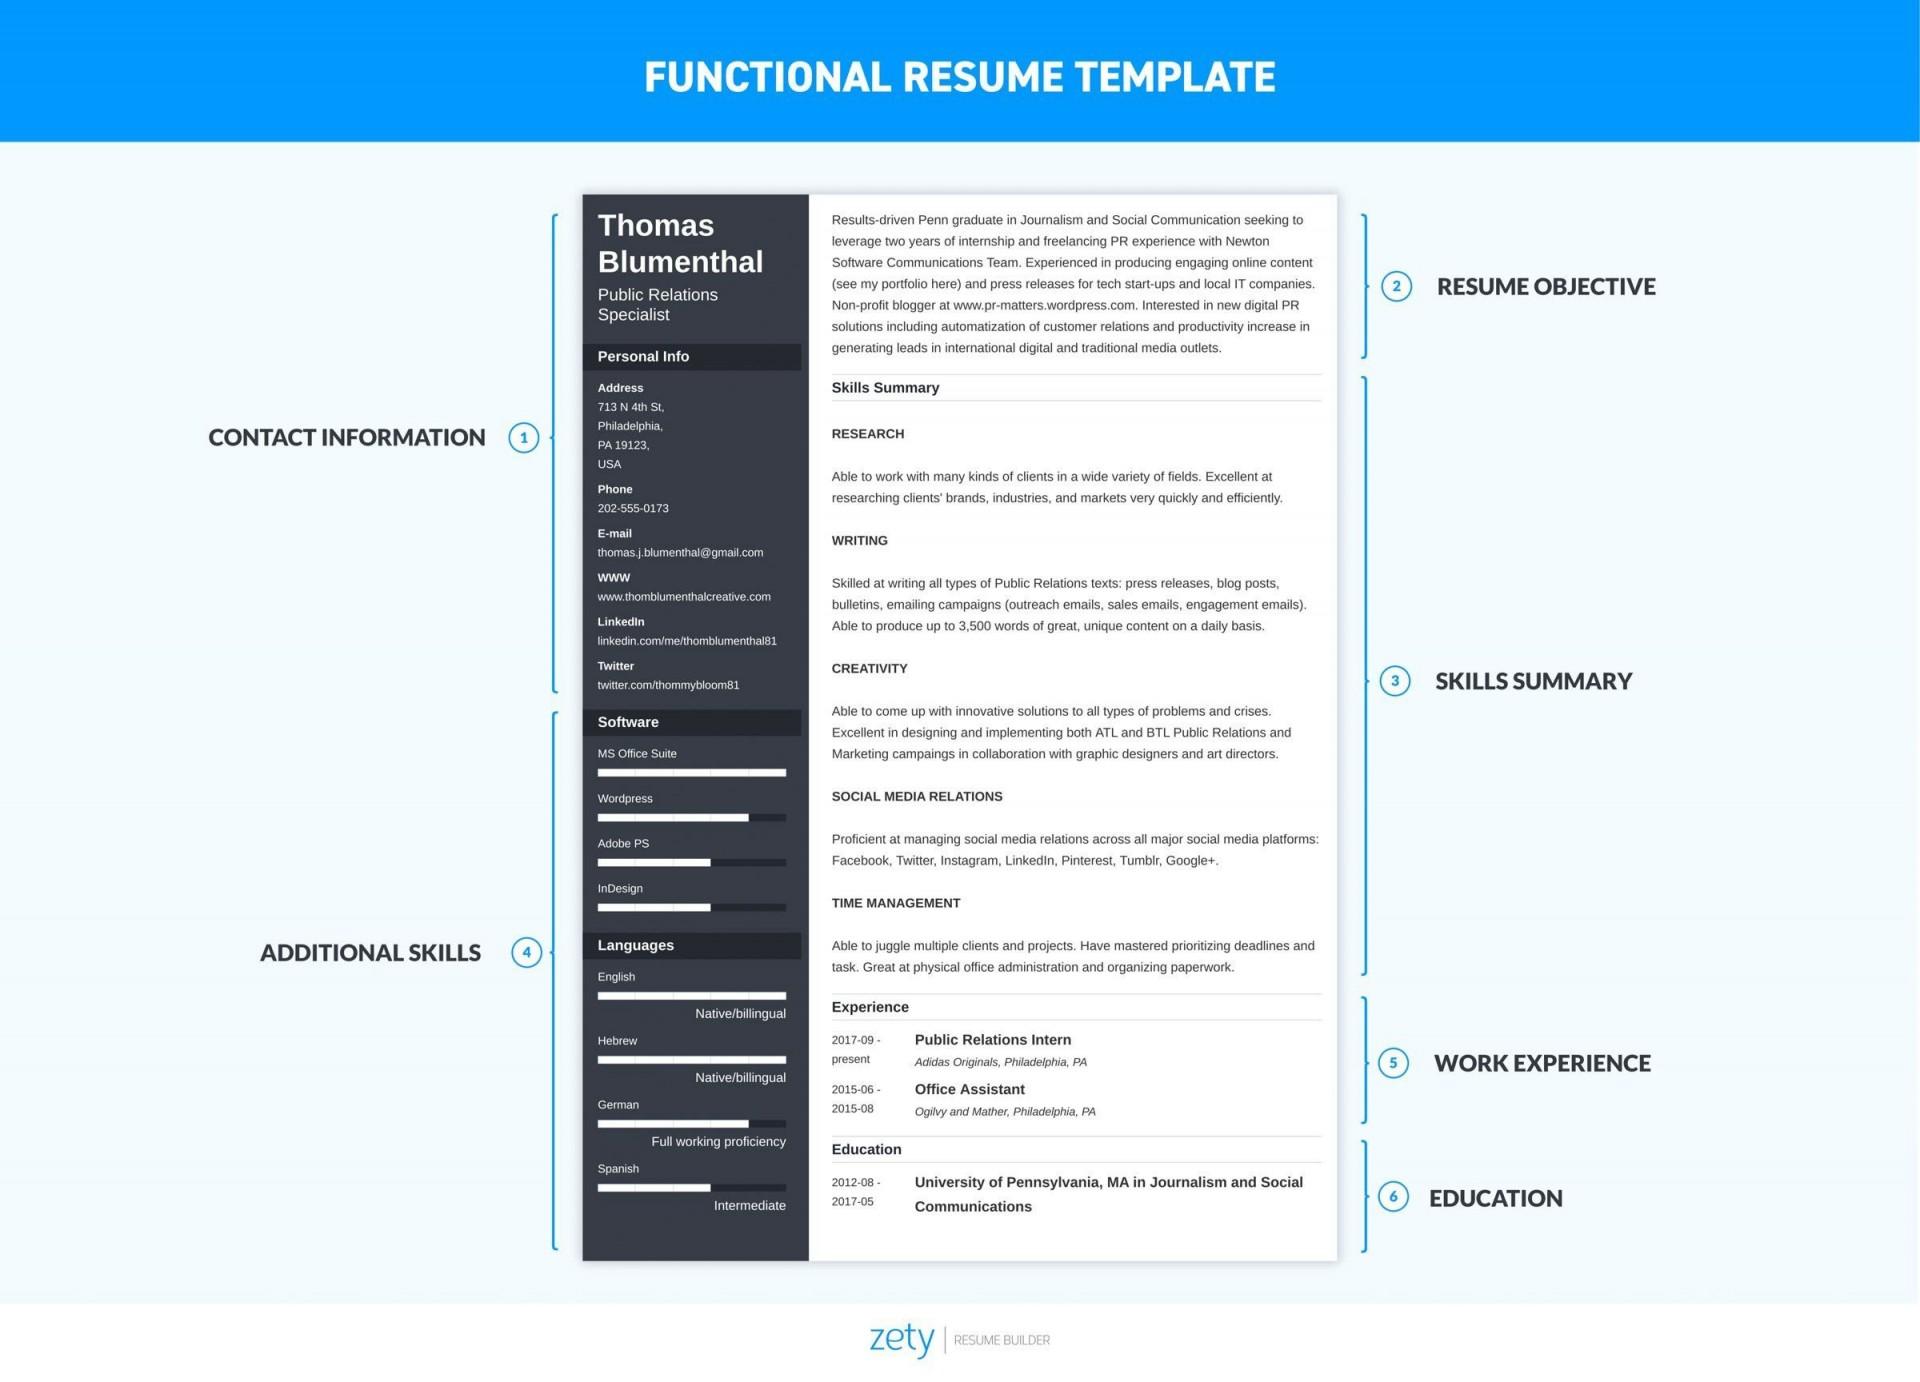 004 Impressive Functional Resume Template Free Example 1920